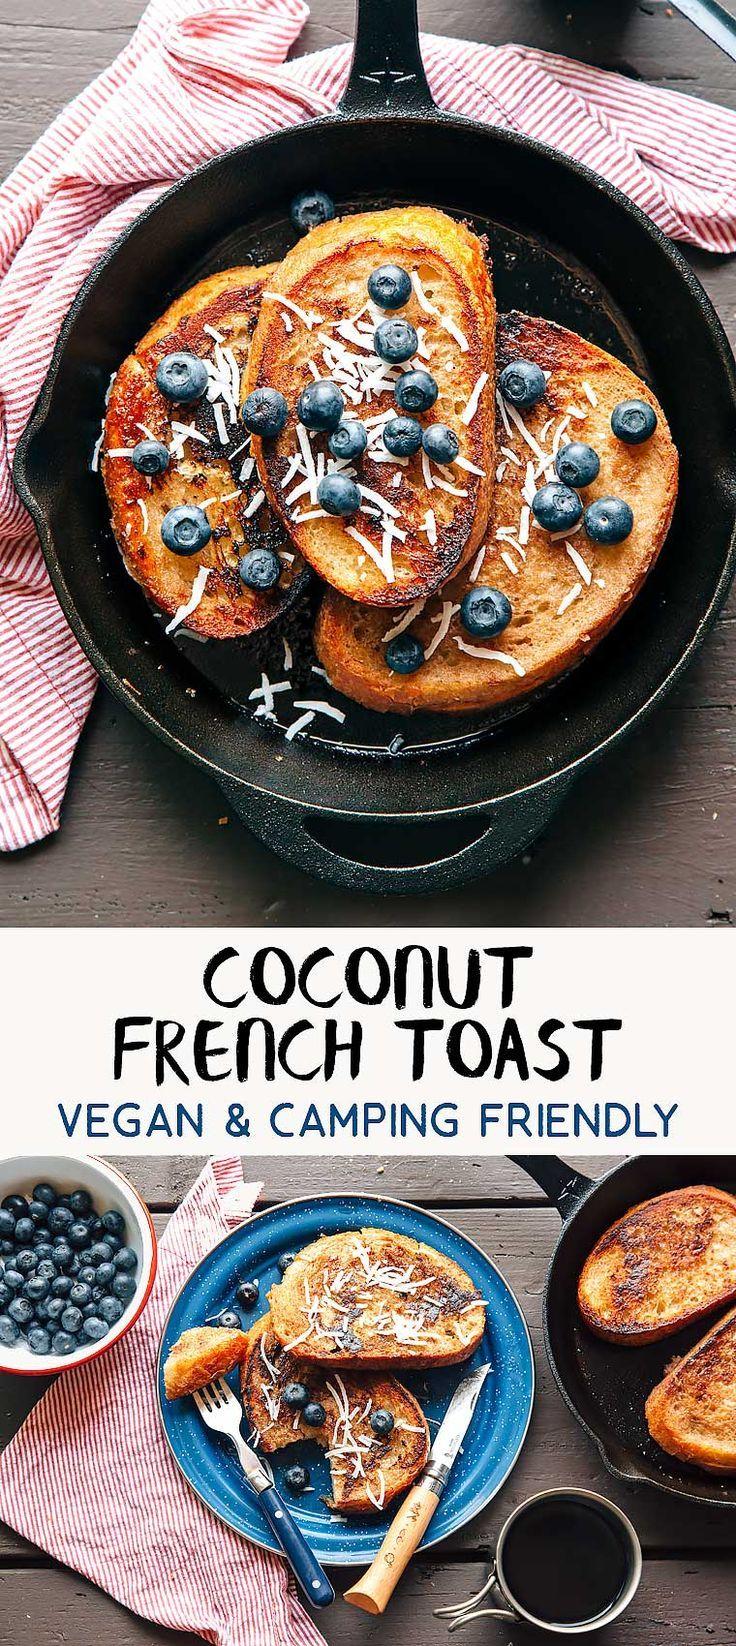 75 best vegan camping food images on pinterest vegetarian